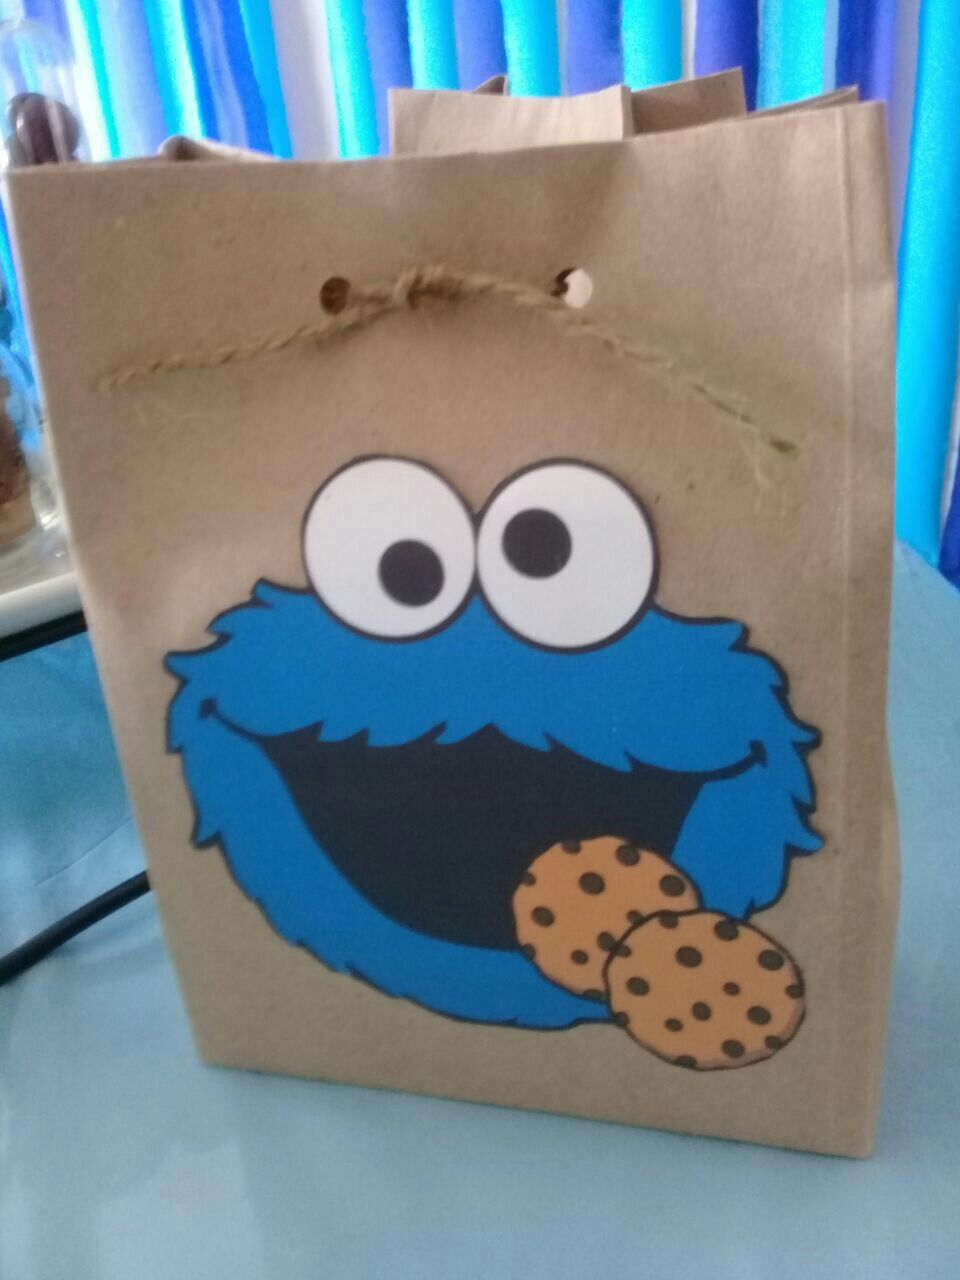 Bolsas sorpresas come galletas | Cumple Jero ! | Pinterest | Come ...